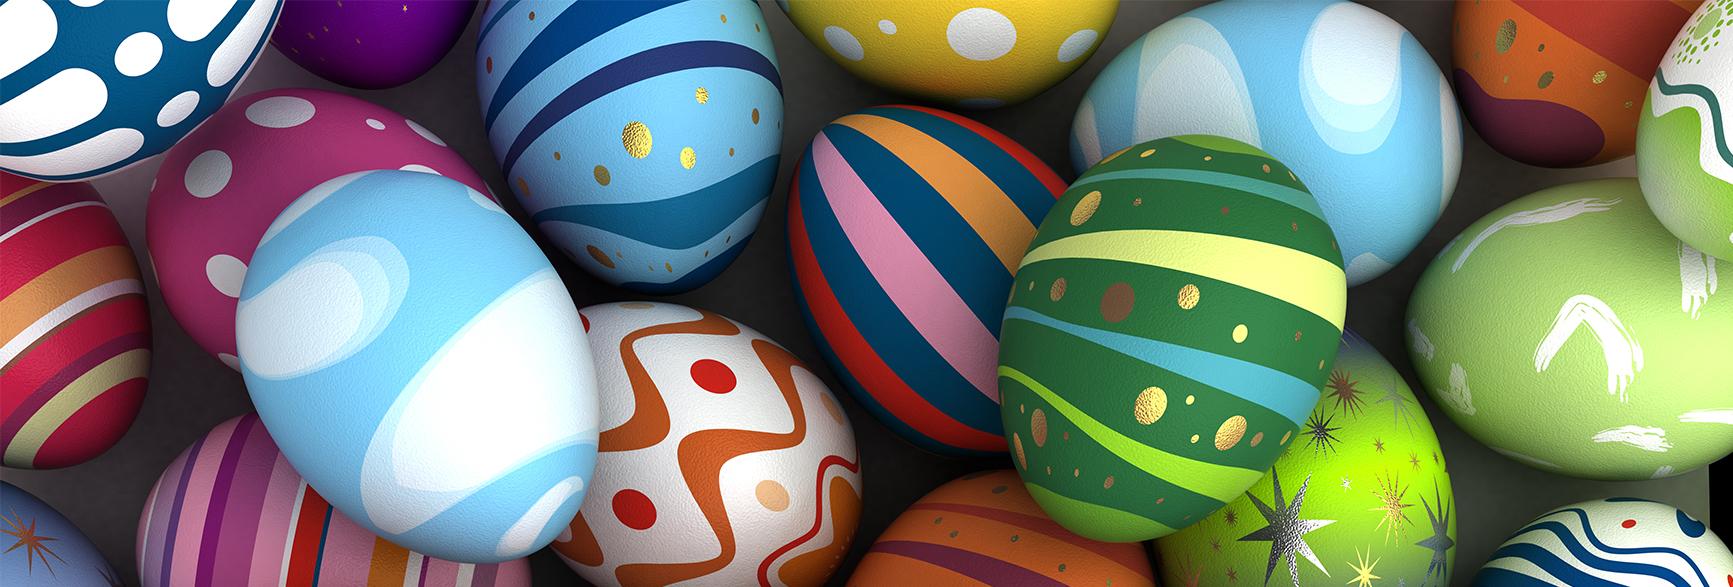 The religious marketing secret behind Easter eggs